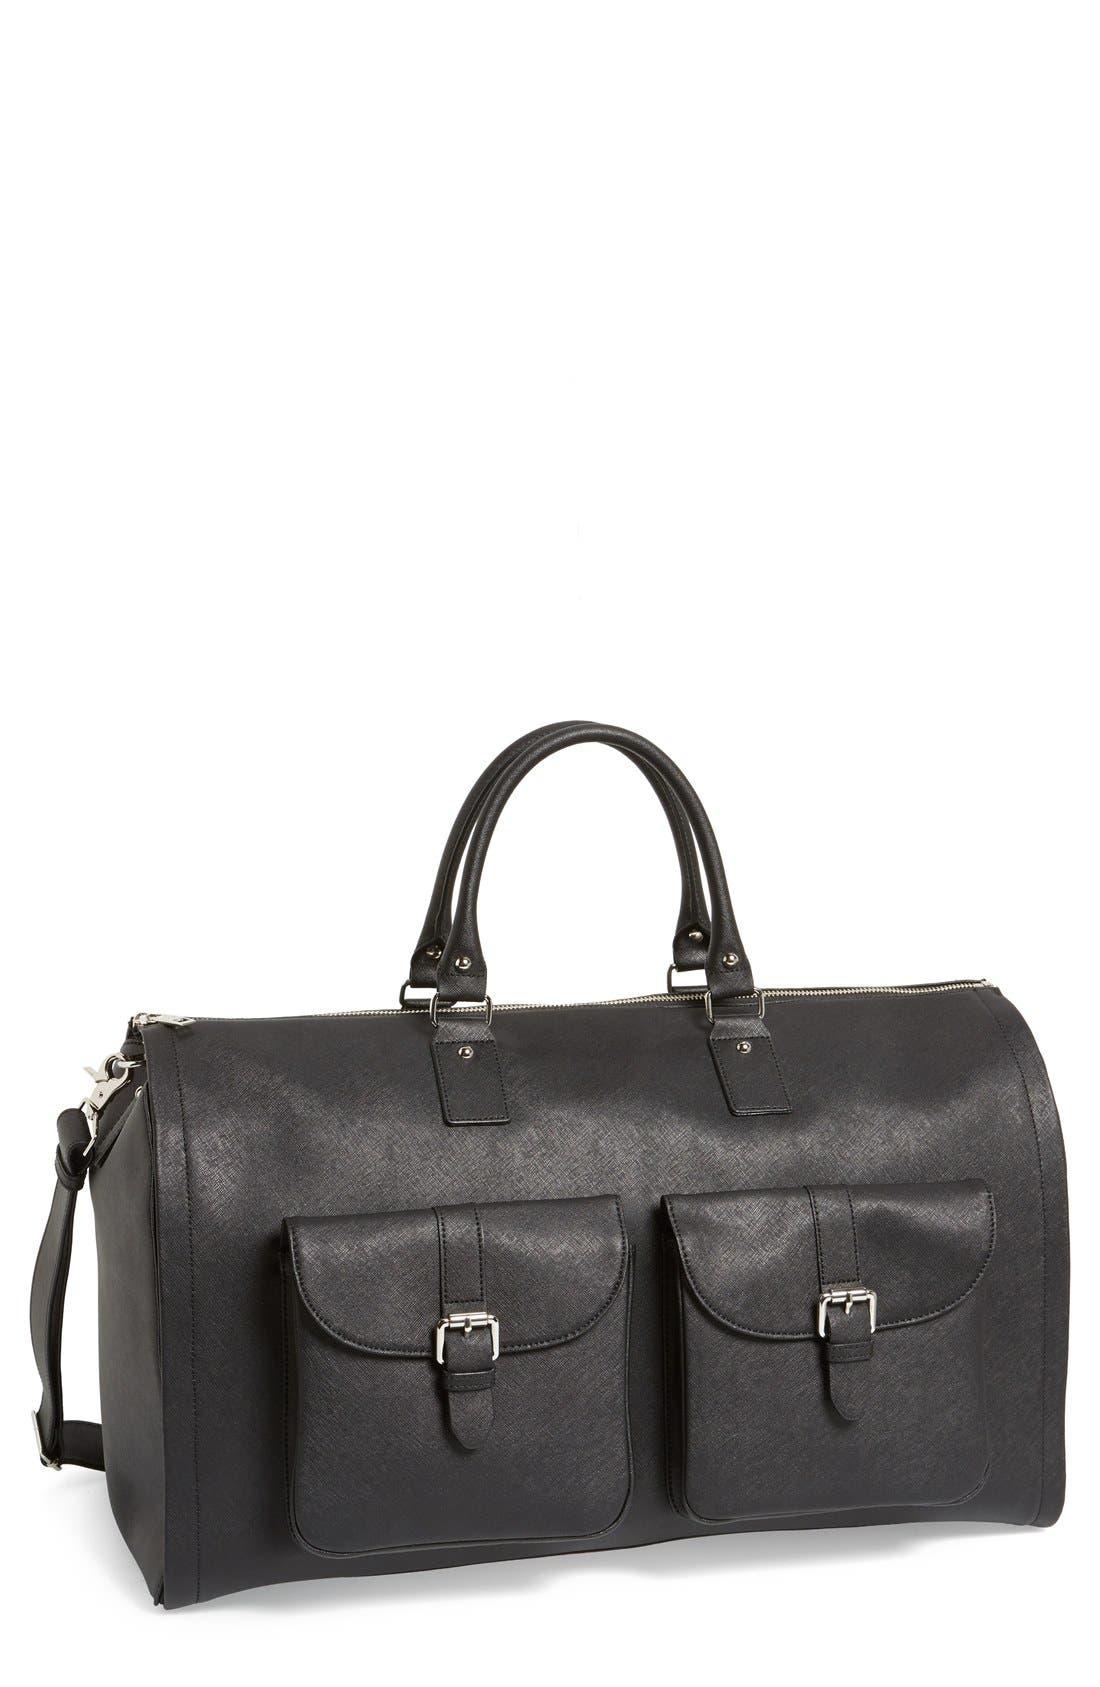 Alternate Image 1 Selected - hook + ALBERT Saffiano Leather Garment/Duffel Bag